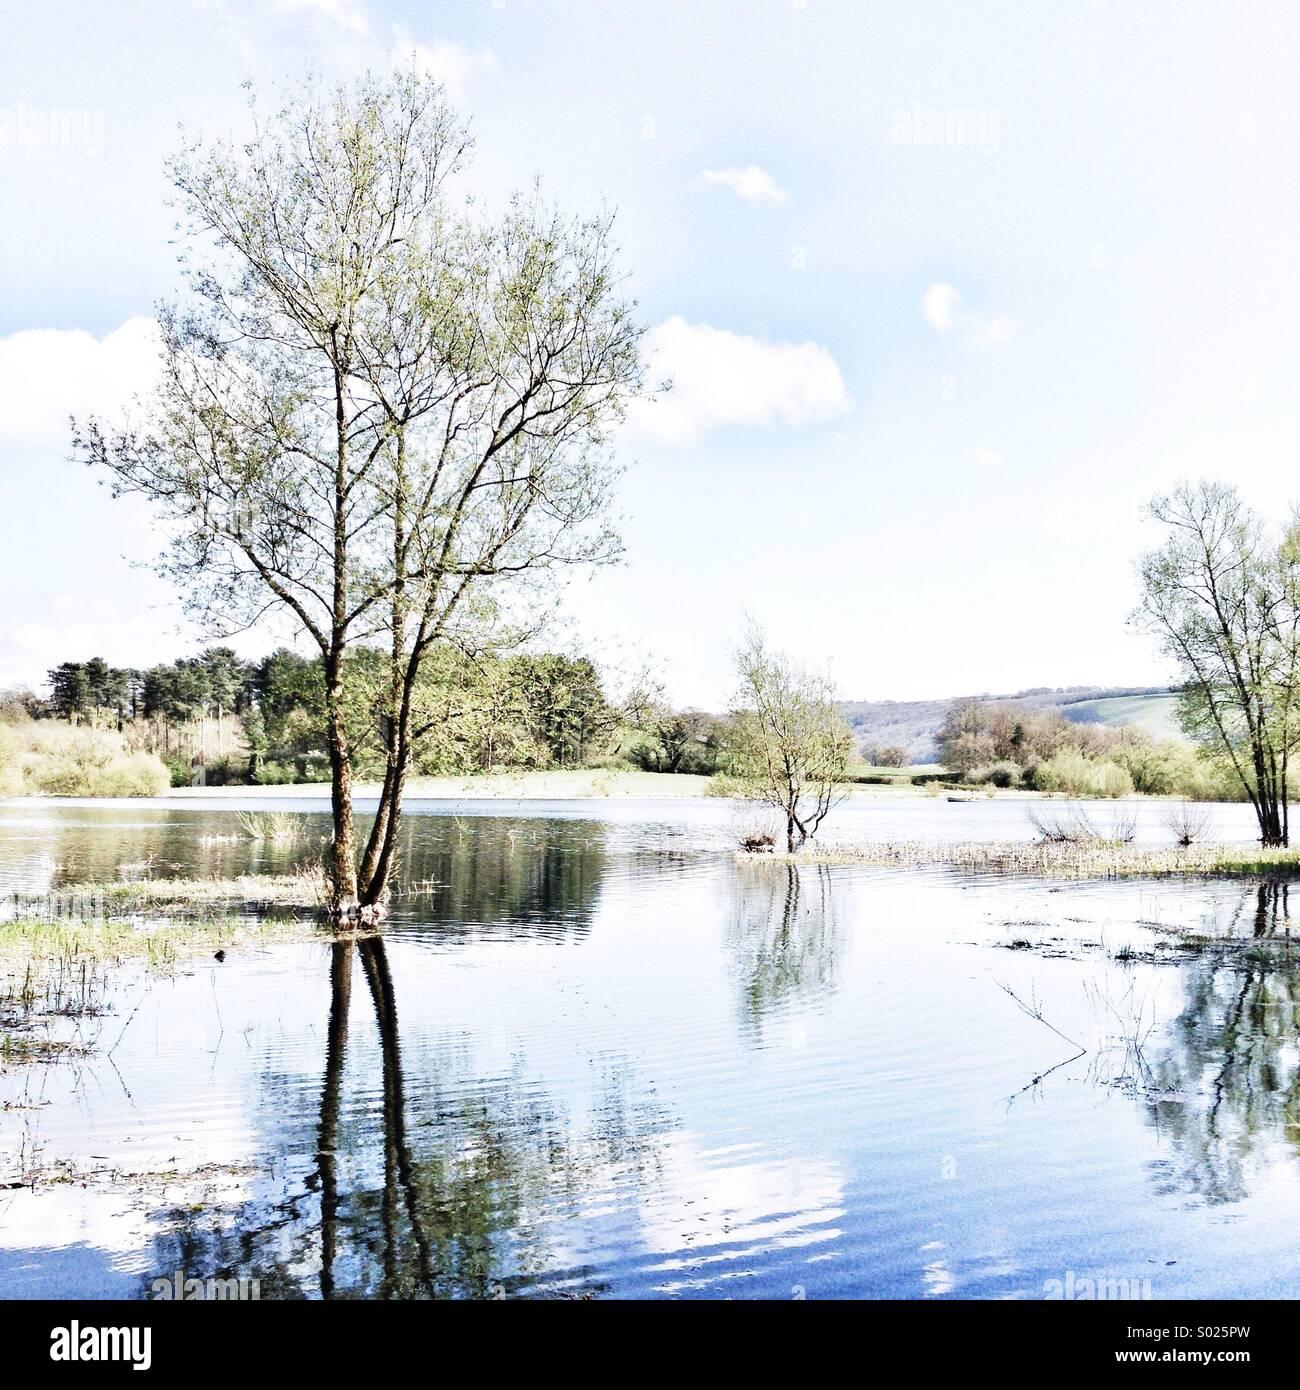 Flooded trees of Blagdon lake - Stock Image